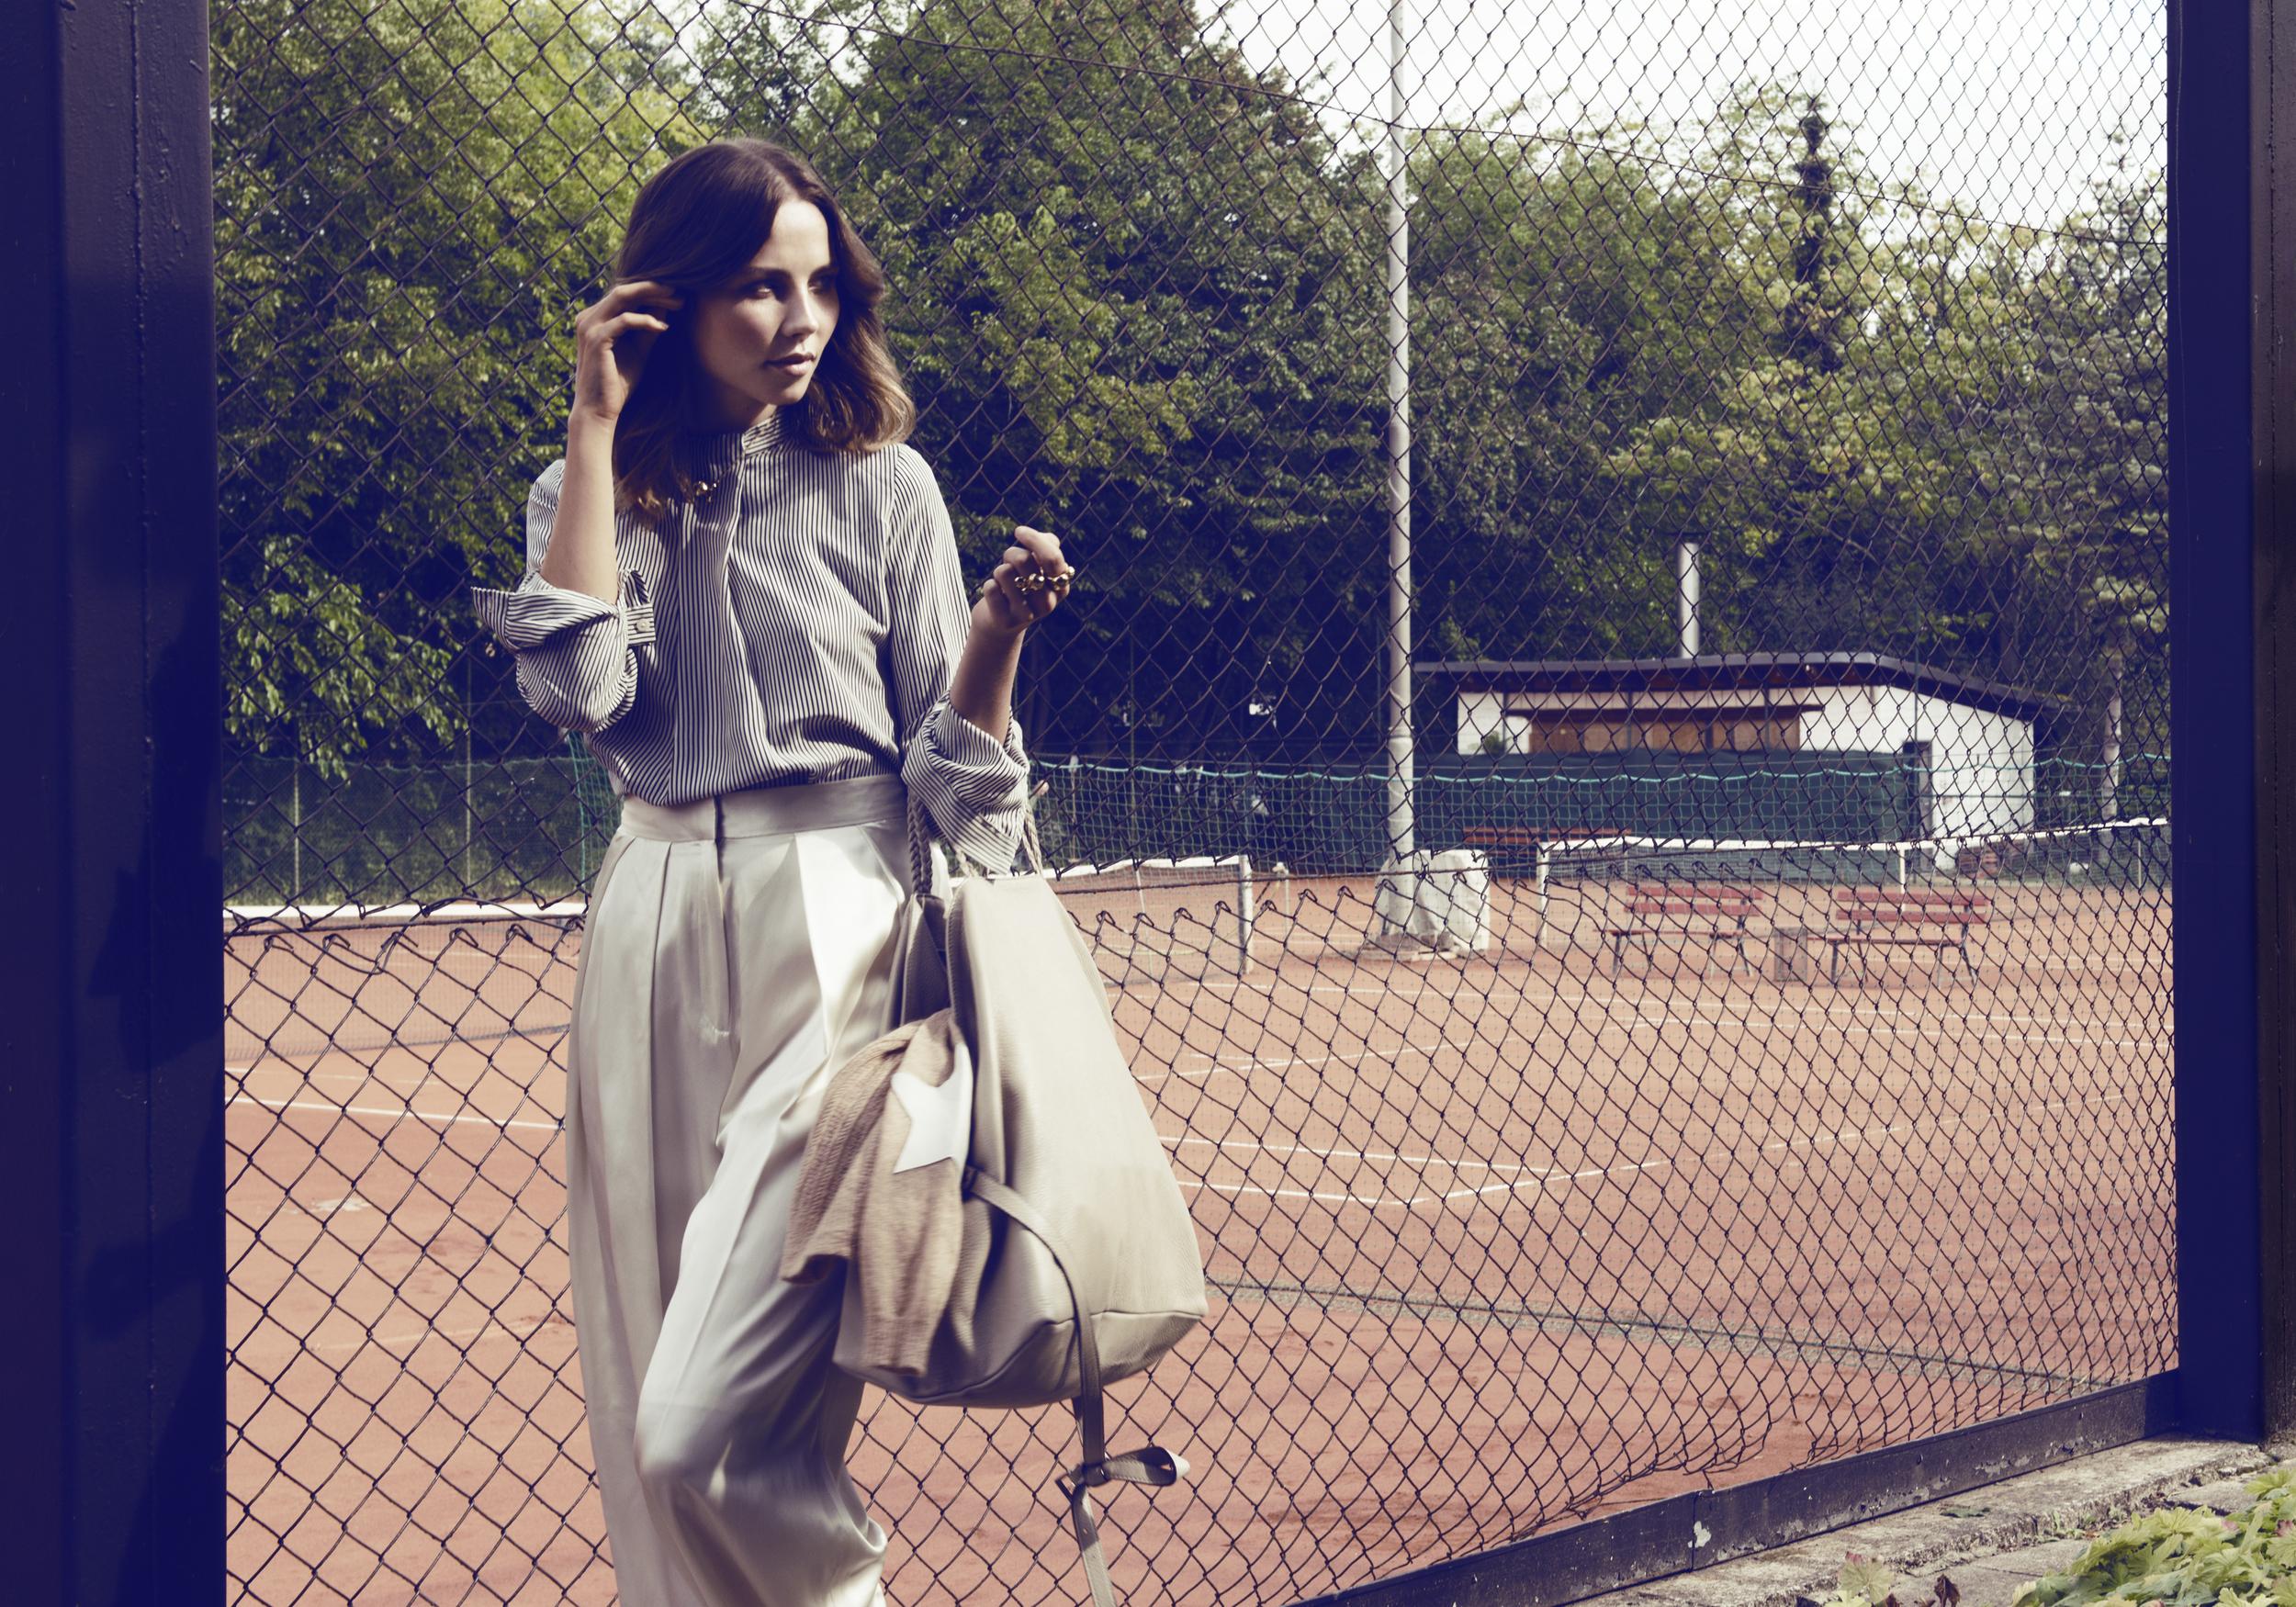 01_Tennis-130904_filinefink.jpg